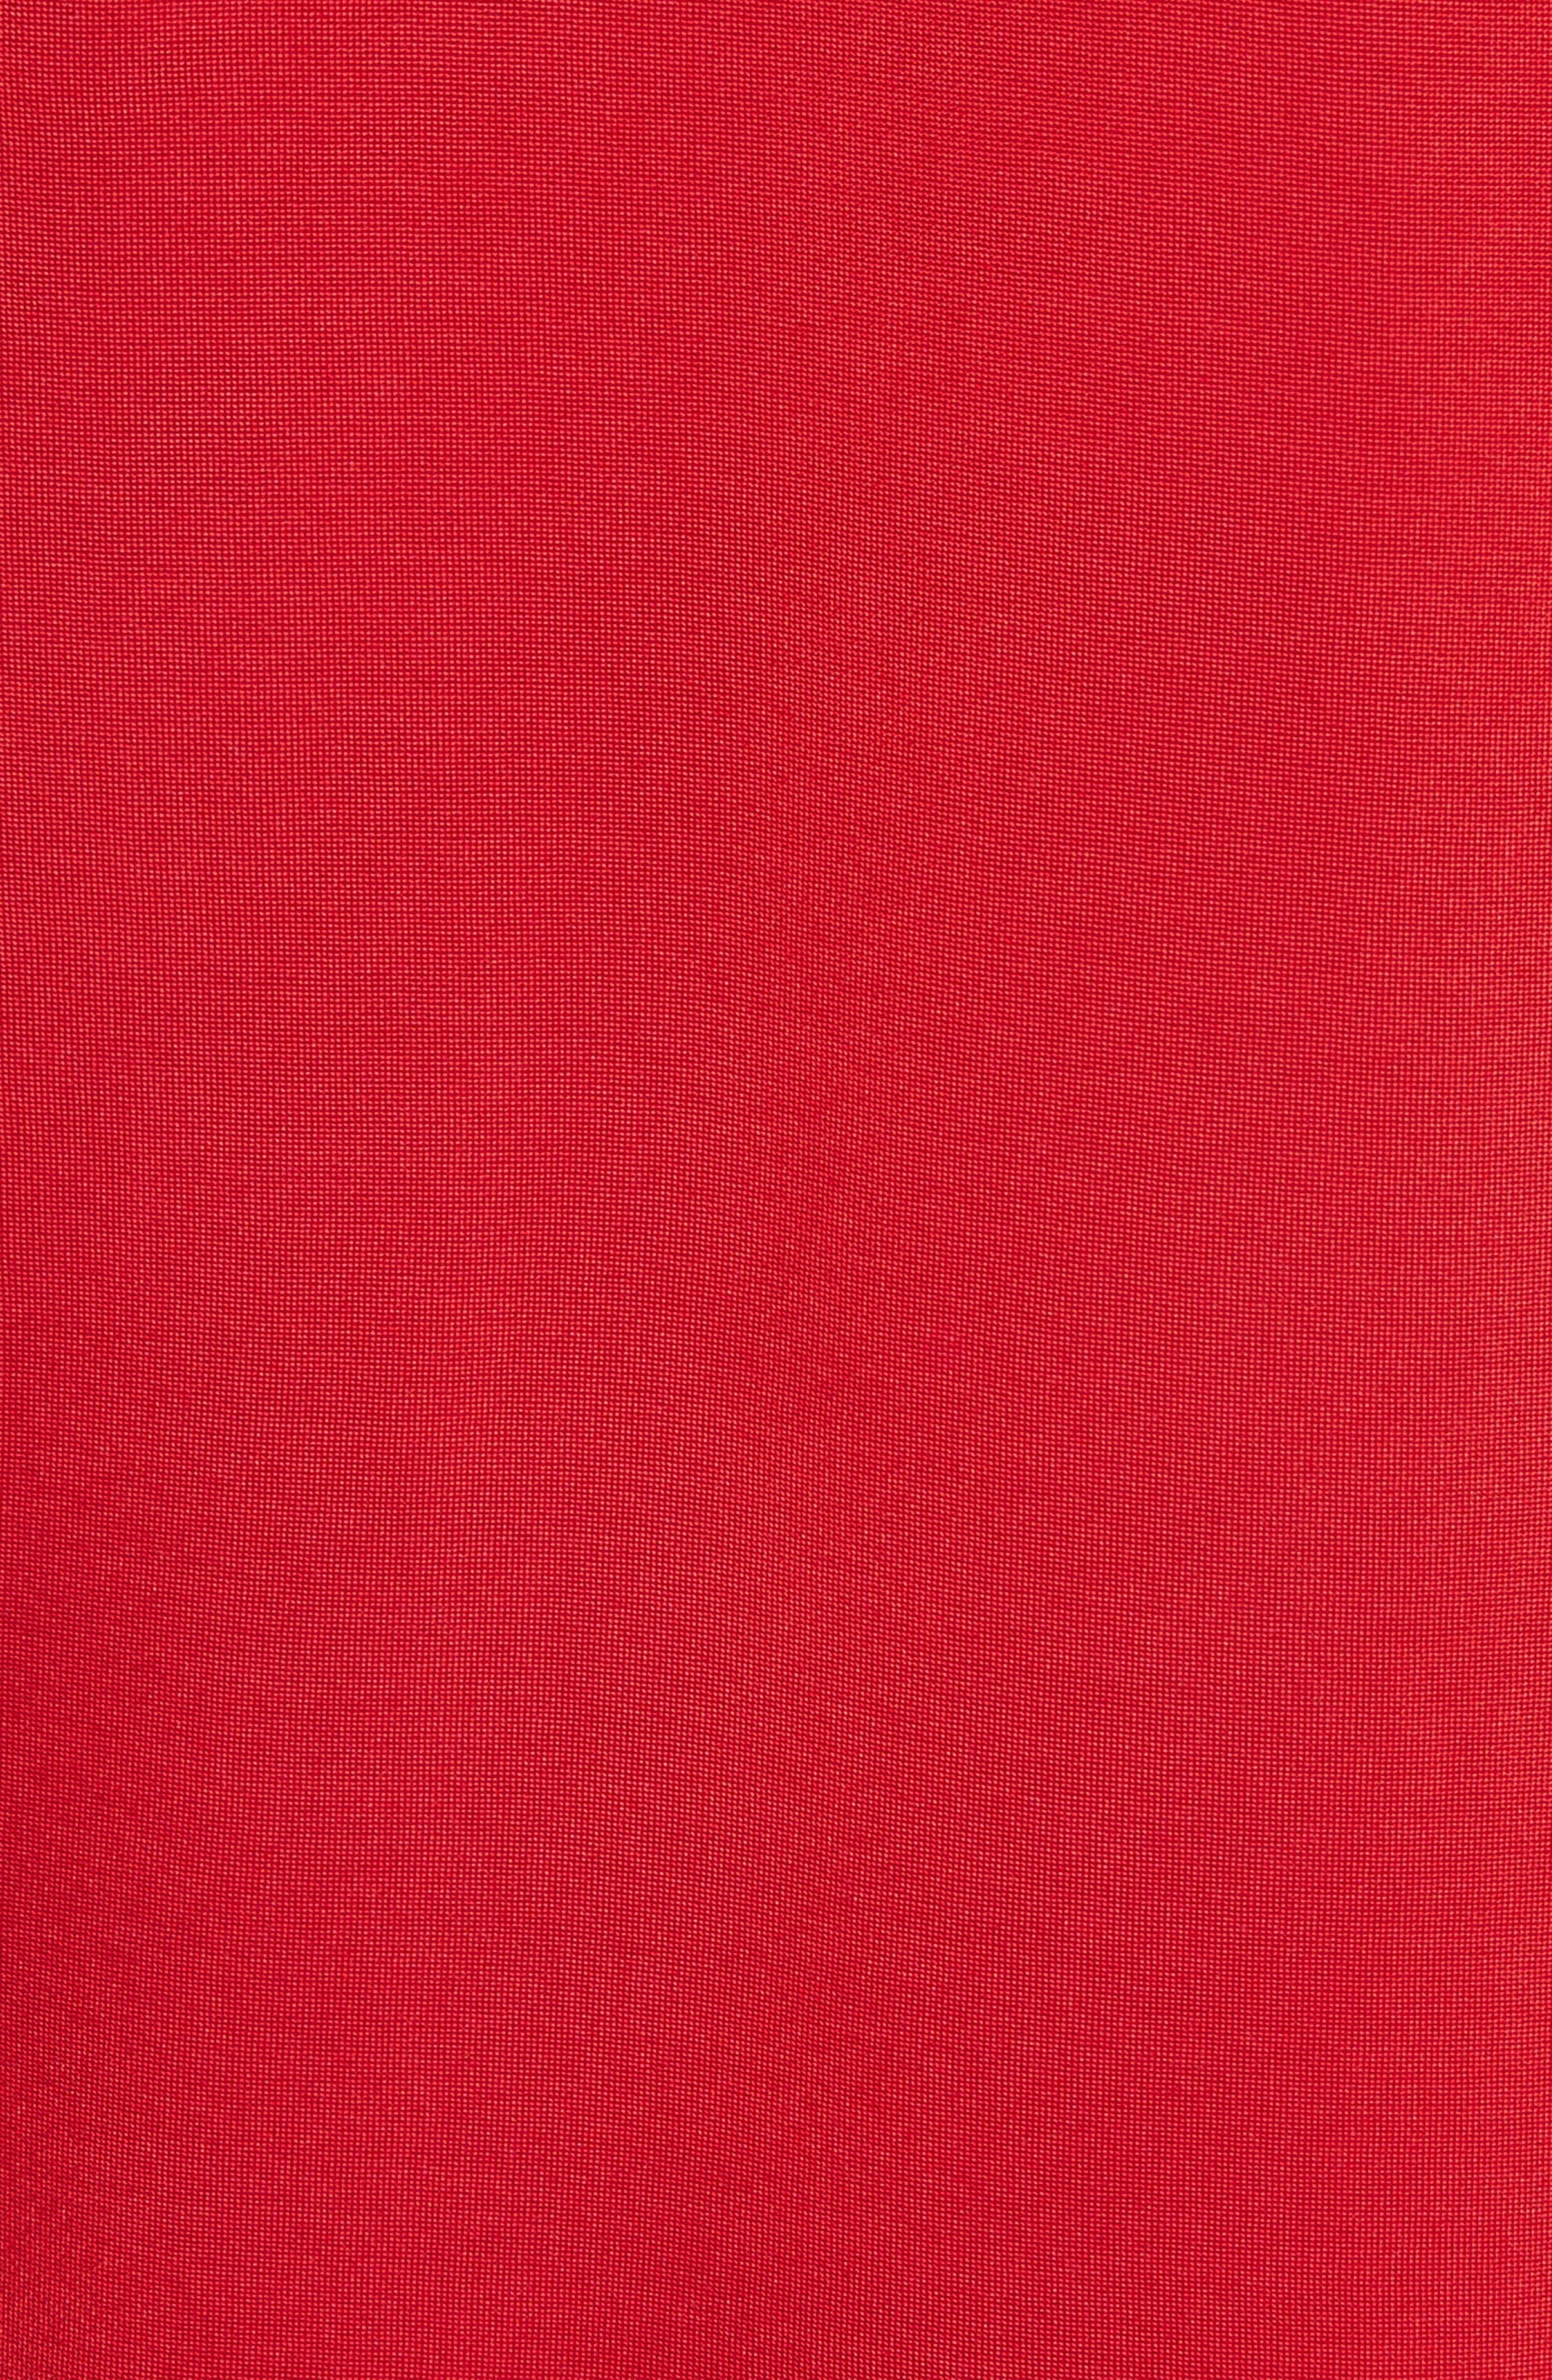 Sporty Asymmetrical Jersey Dress,                             Alternate thumbnail 5, color,                             600